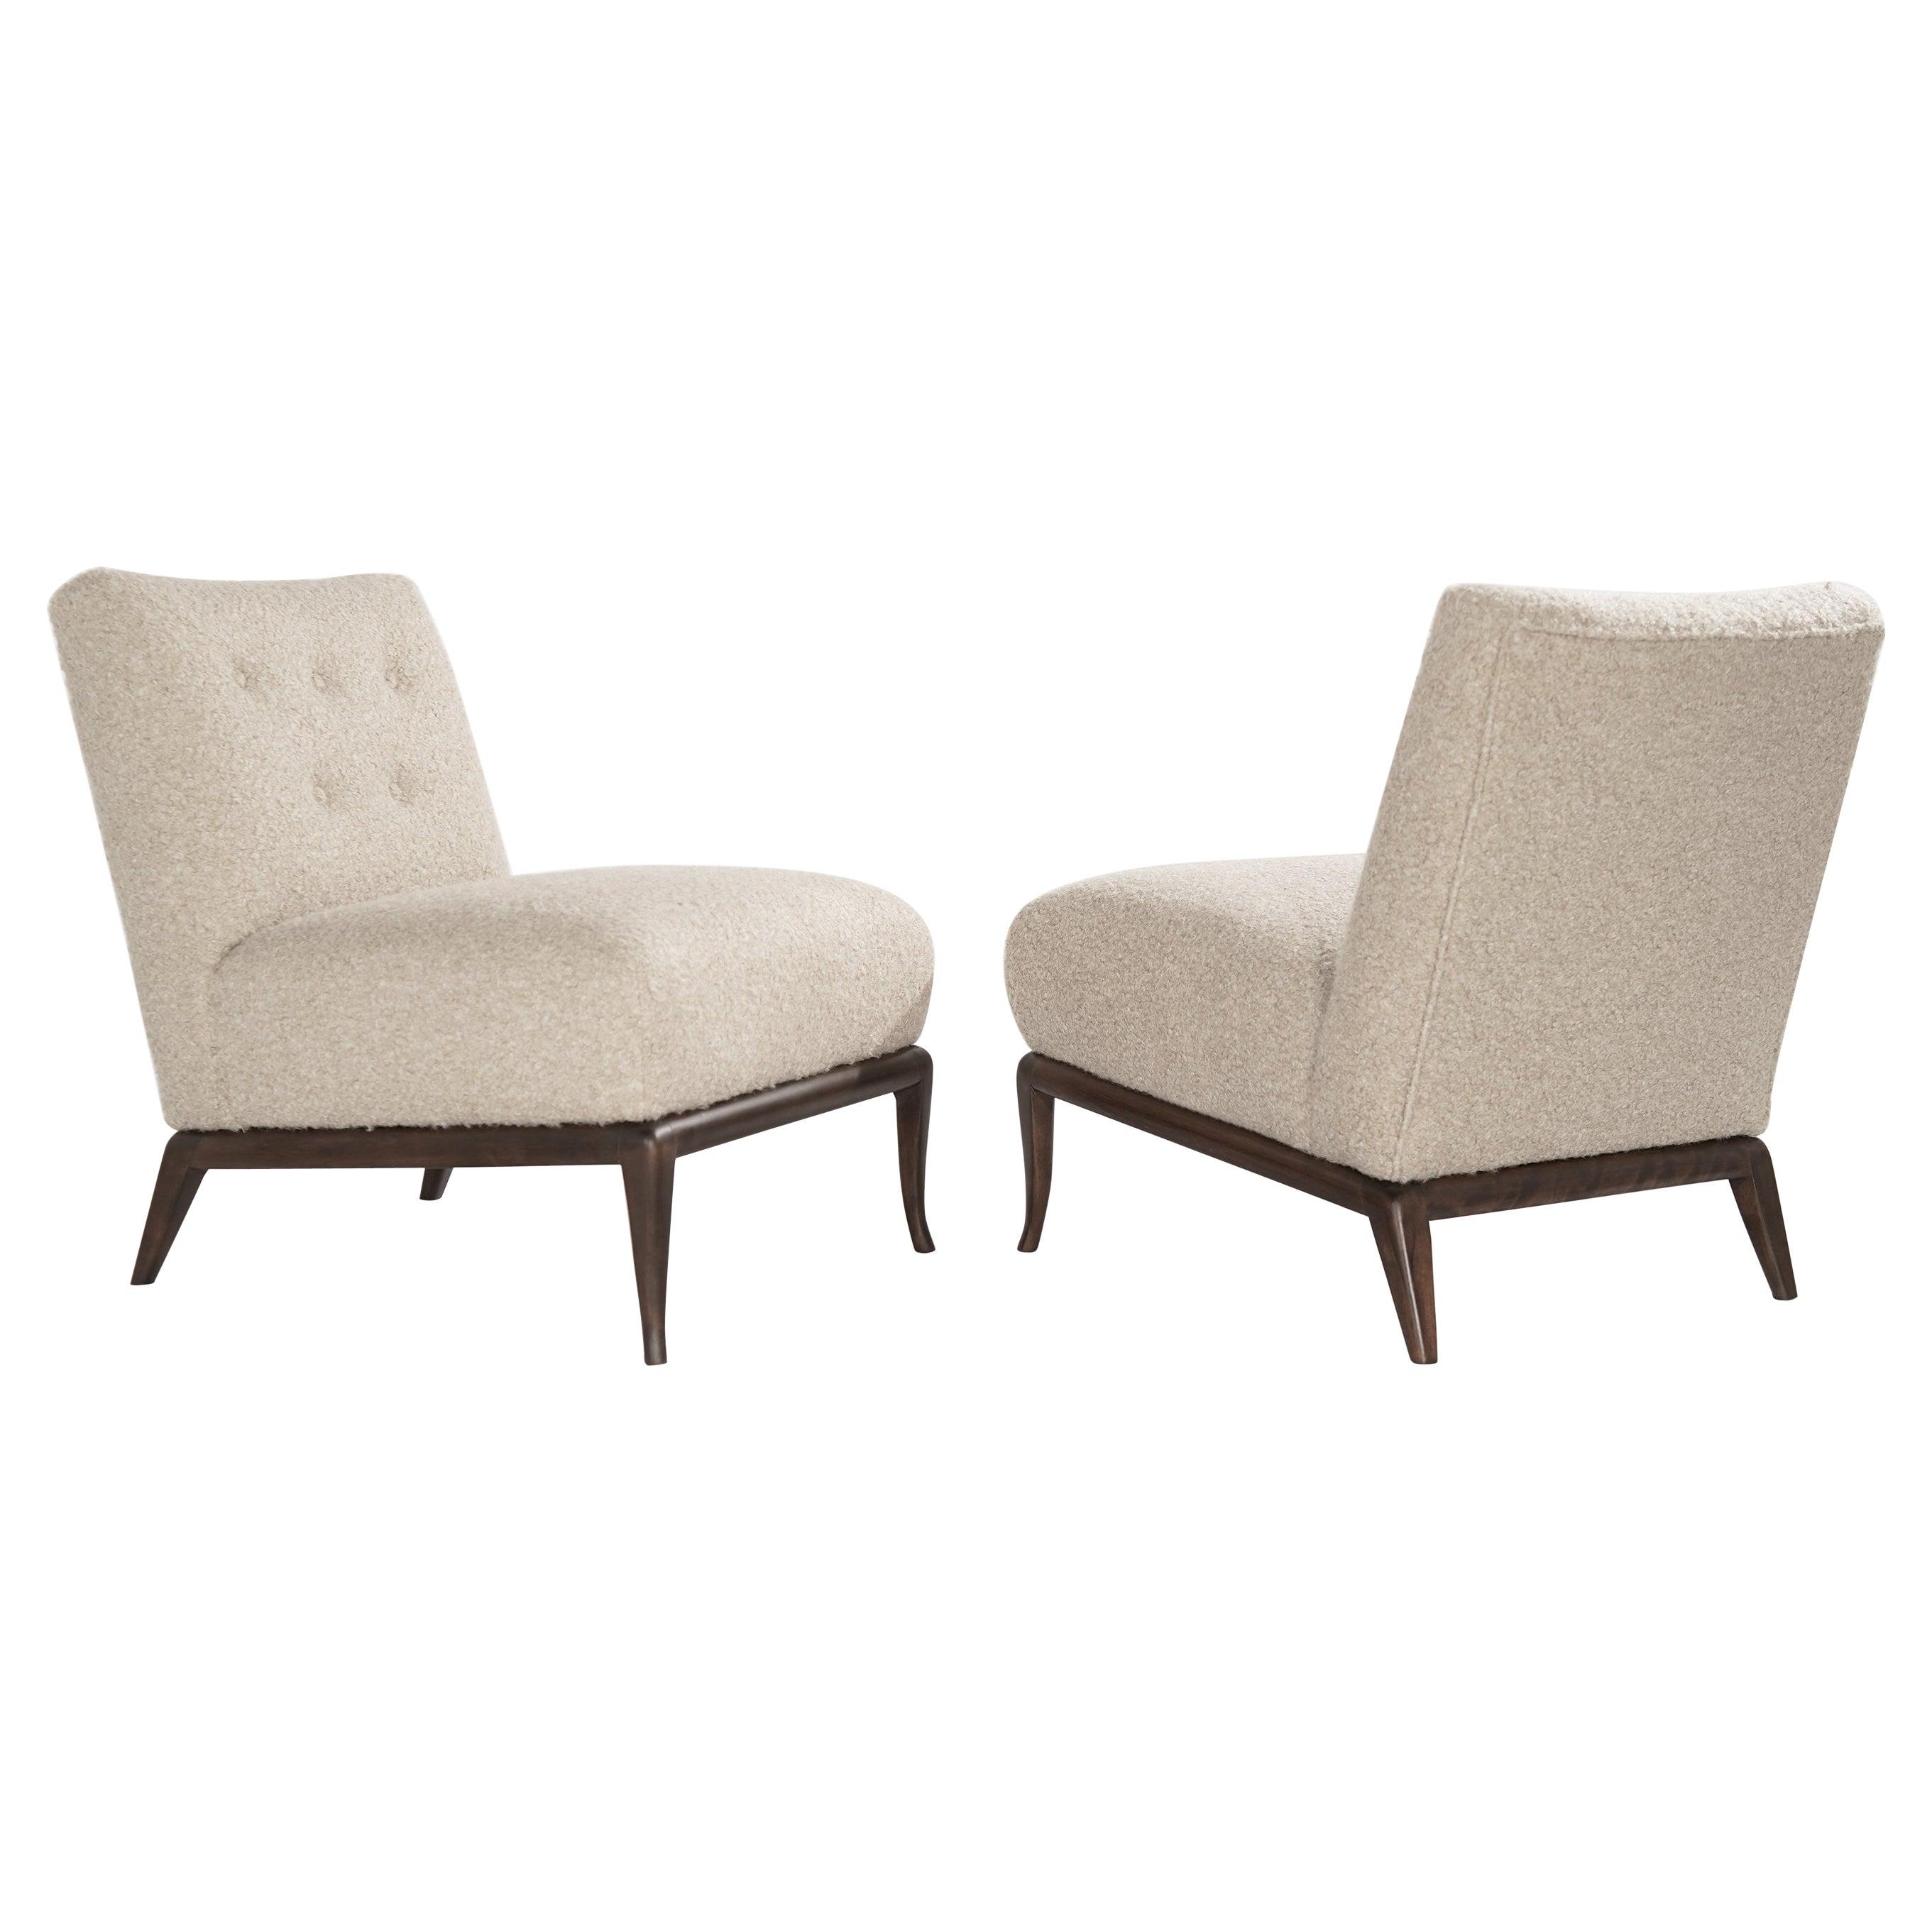 Slipper Chairs in Bouclé by T.H. Robsjohn-Gibbings, circa 1950s